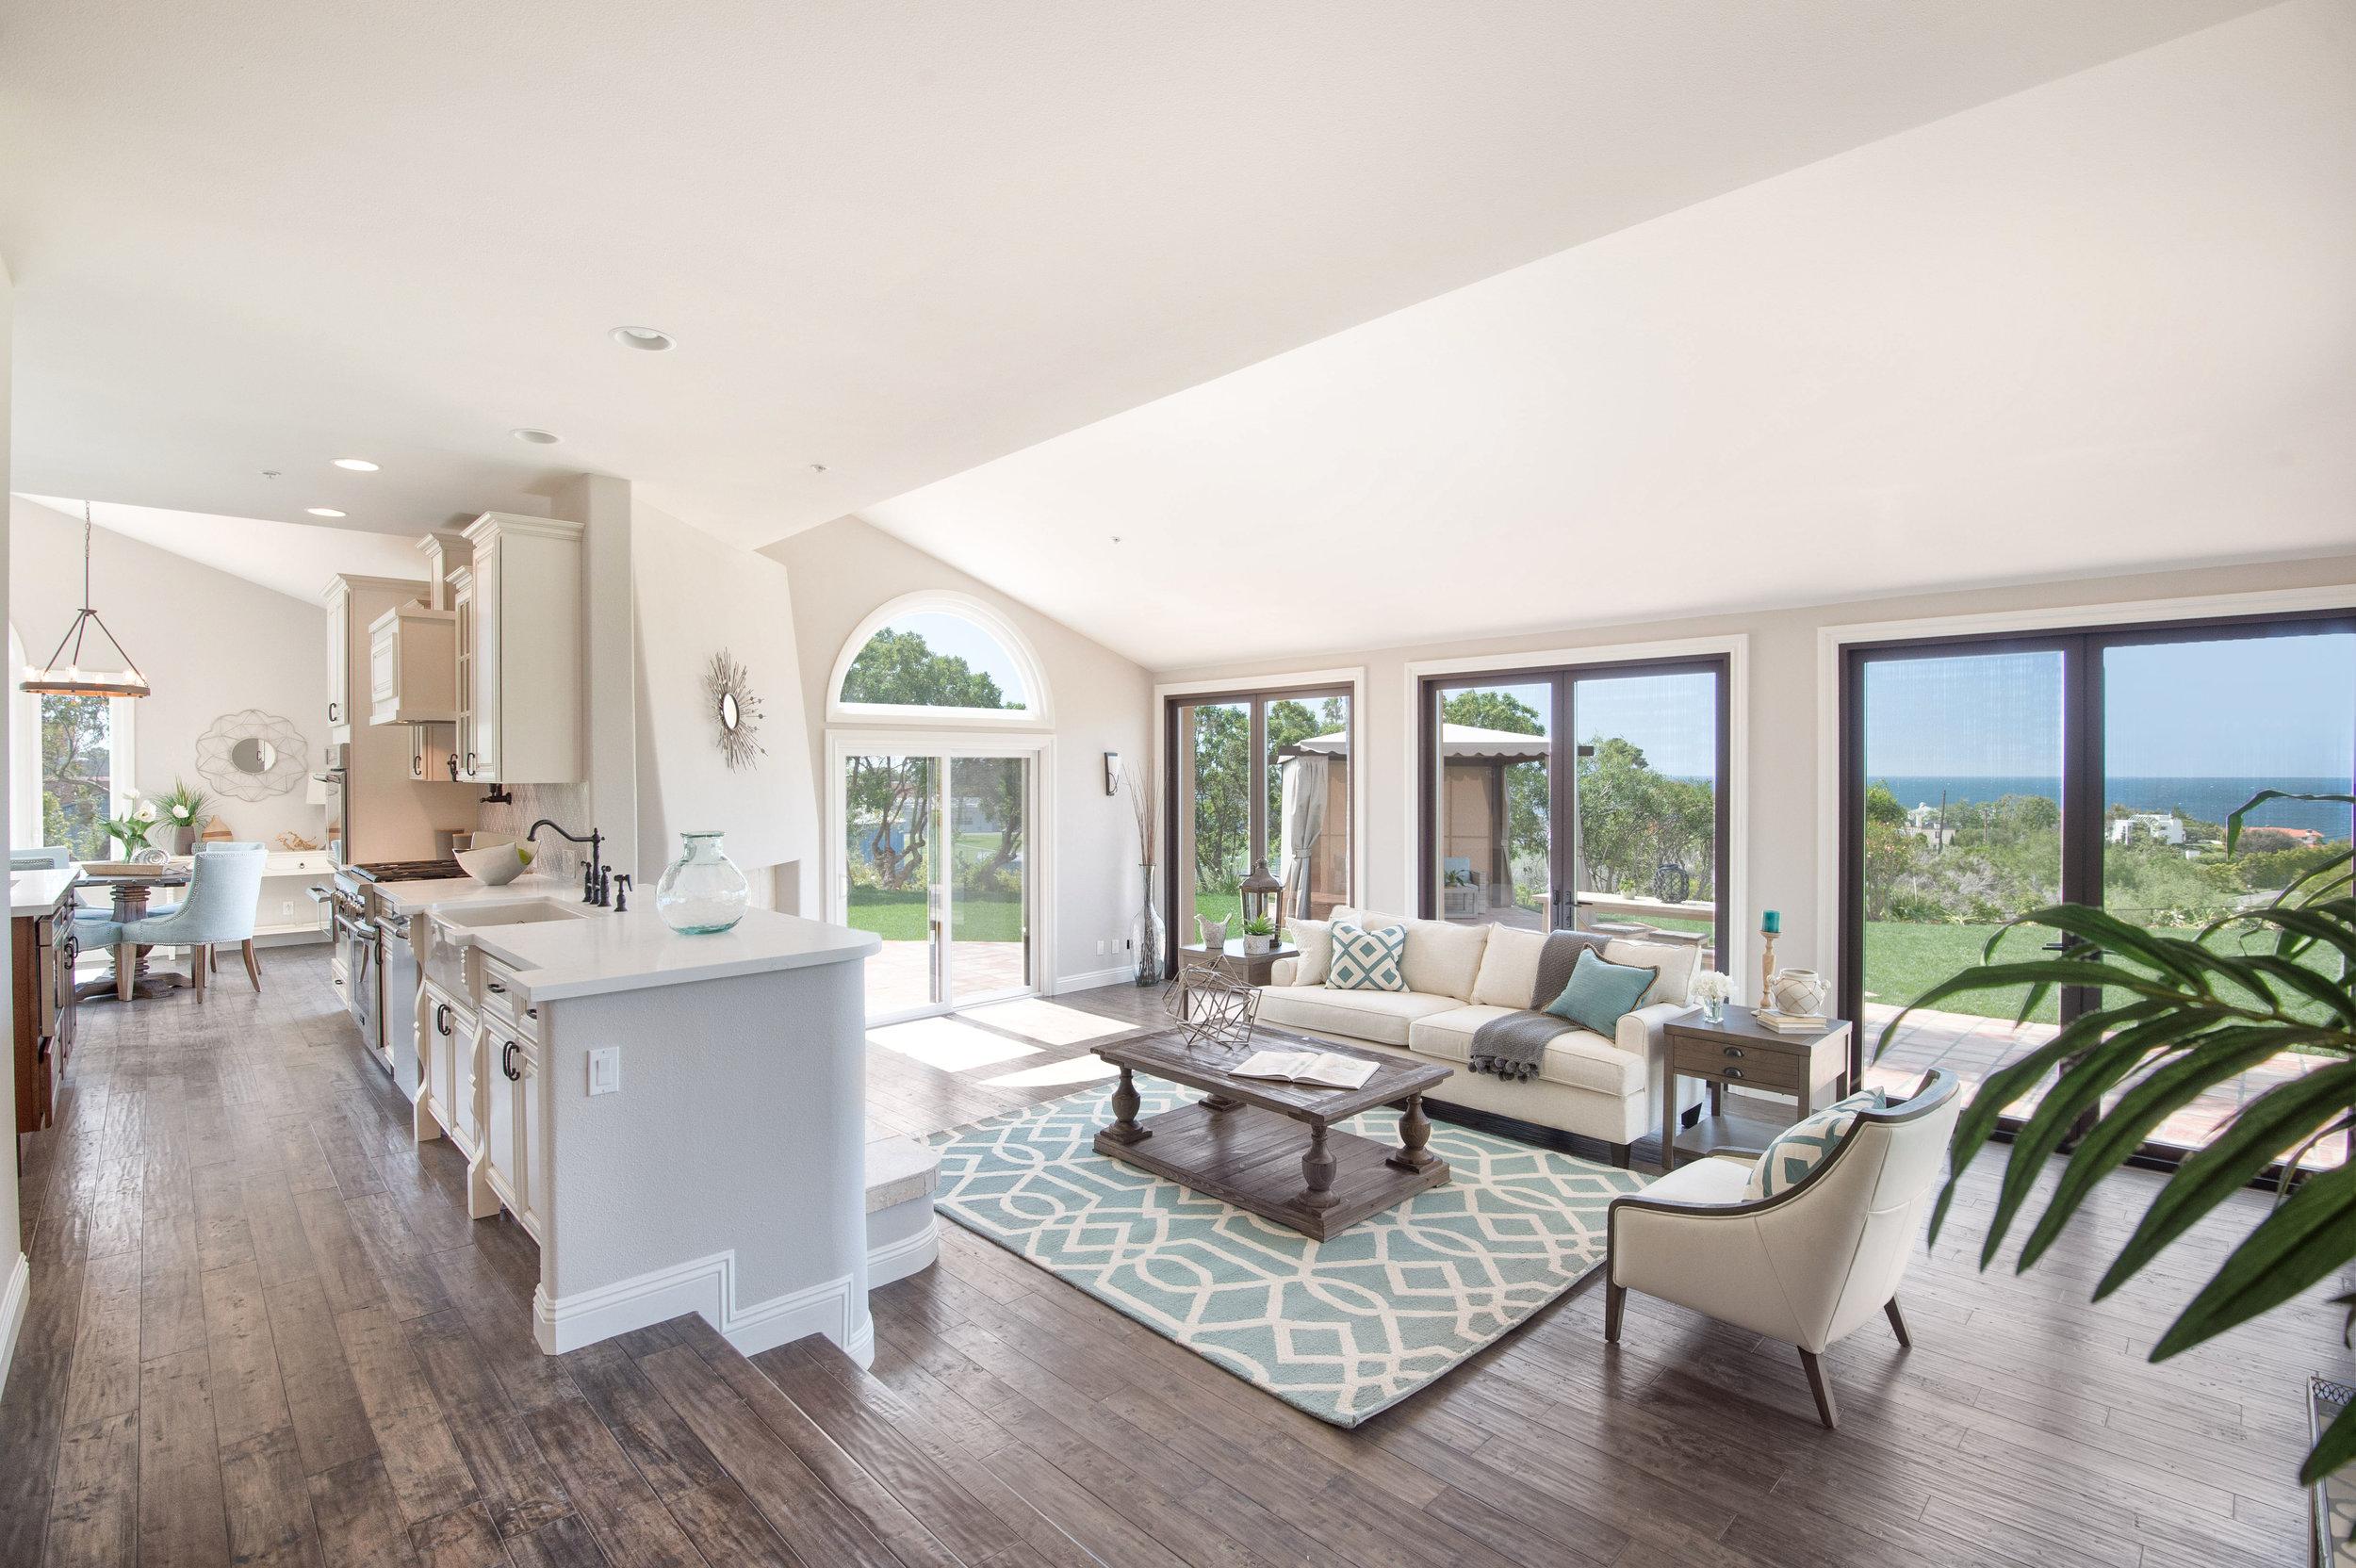 008 6130 Via Cabrillo For Sale Lease The Malibu Life Team Luxury Real Estate.jpg